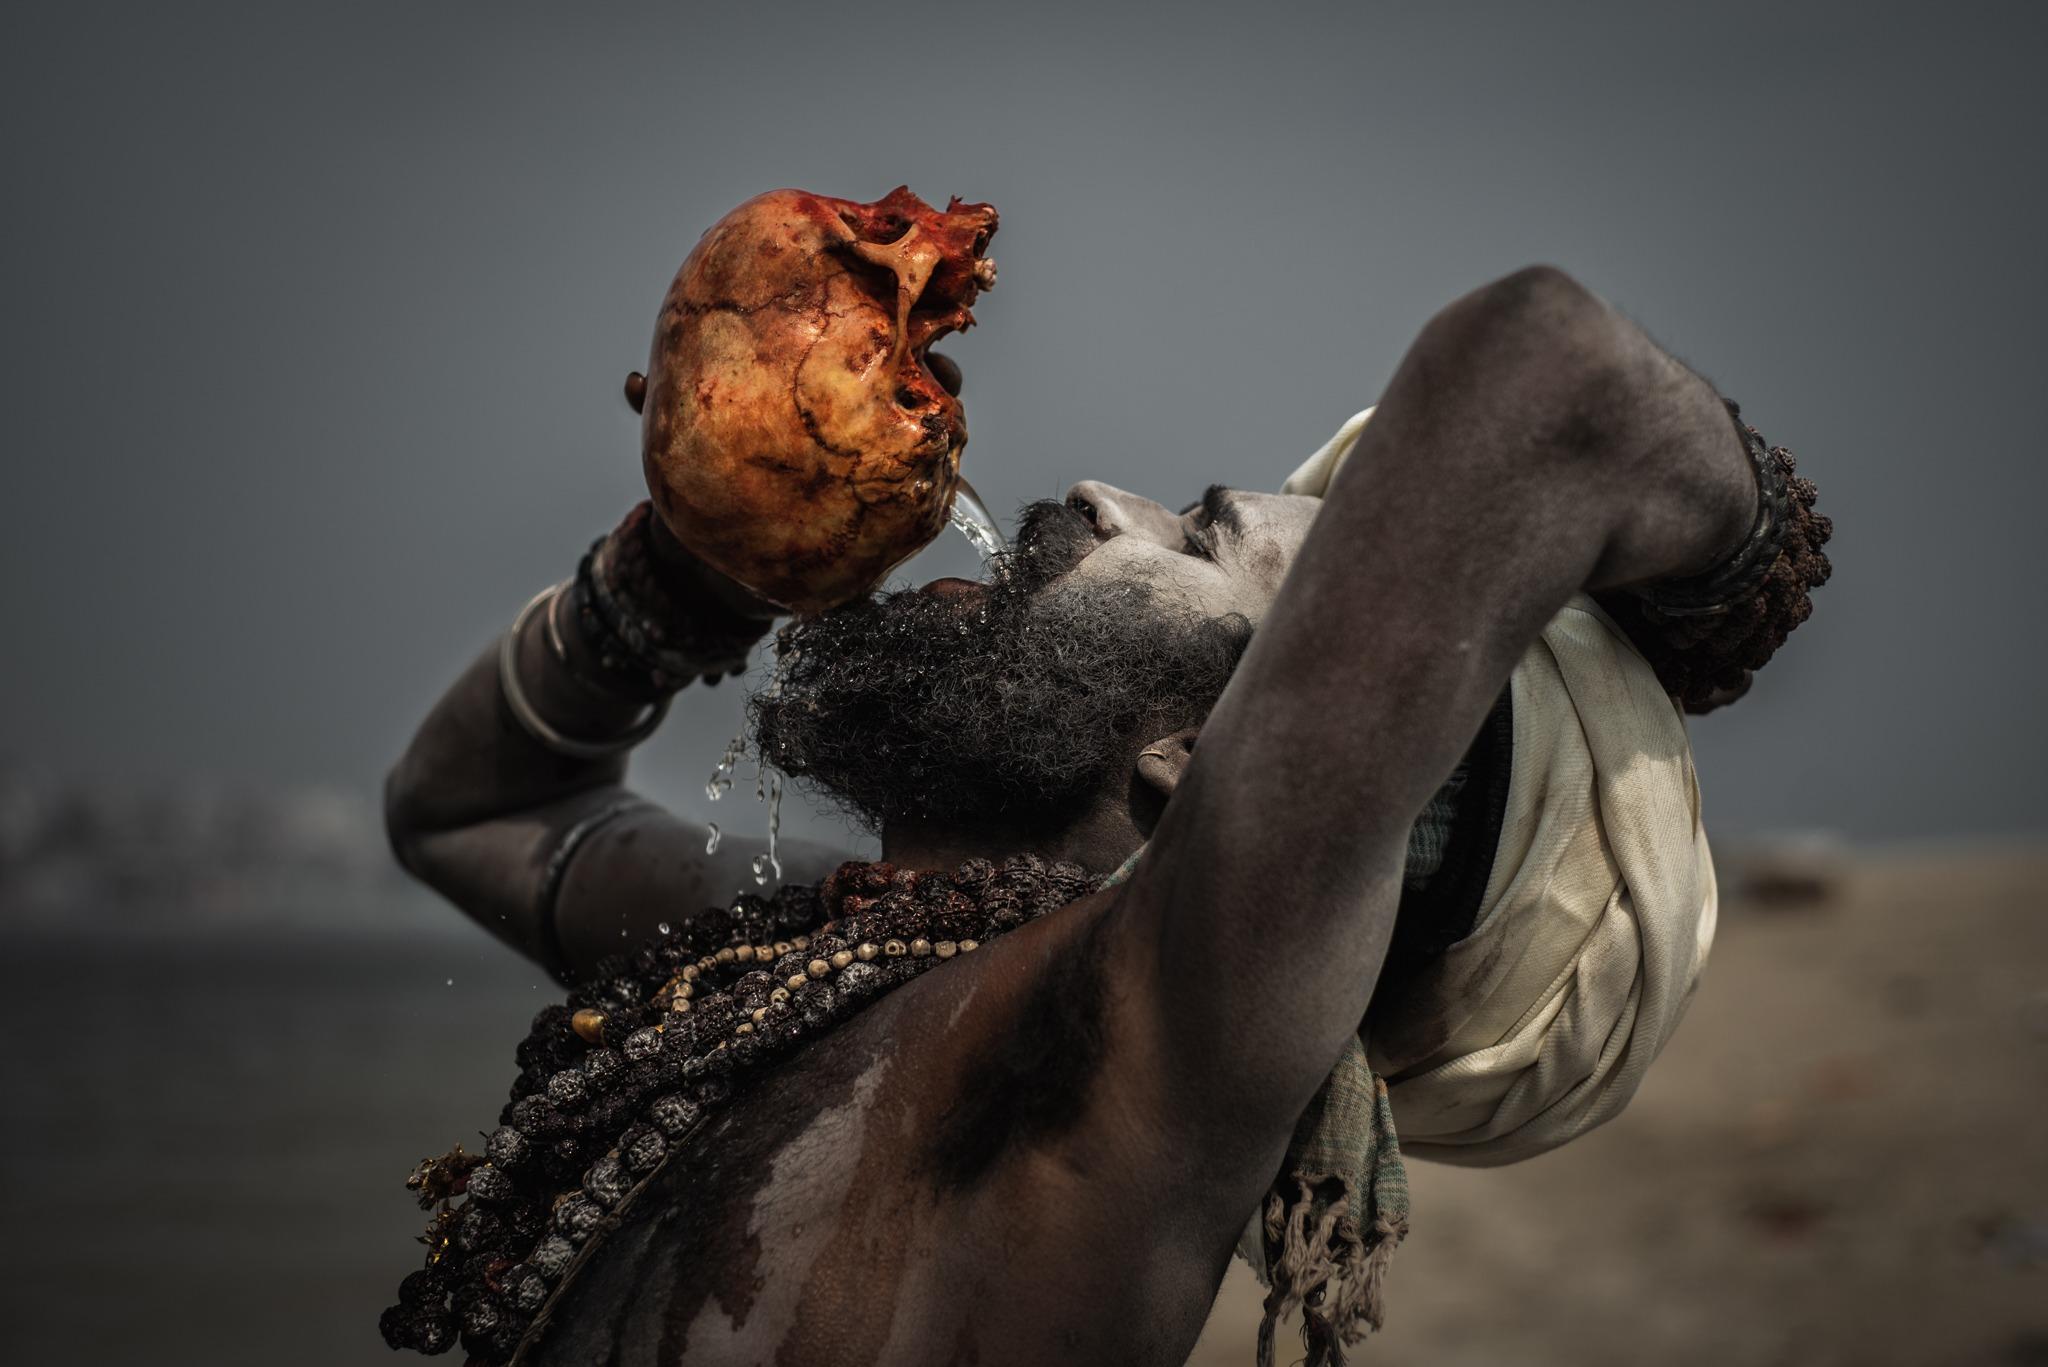 Aghori cannibals